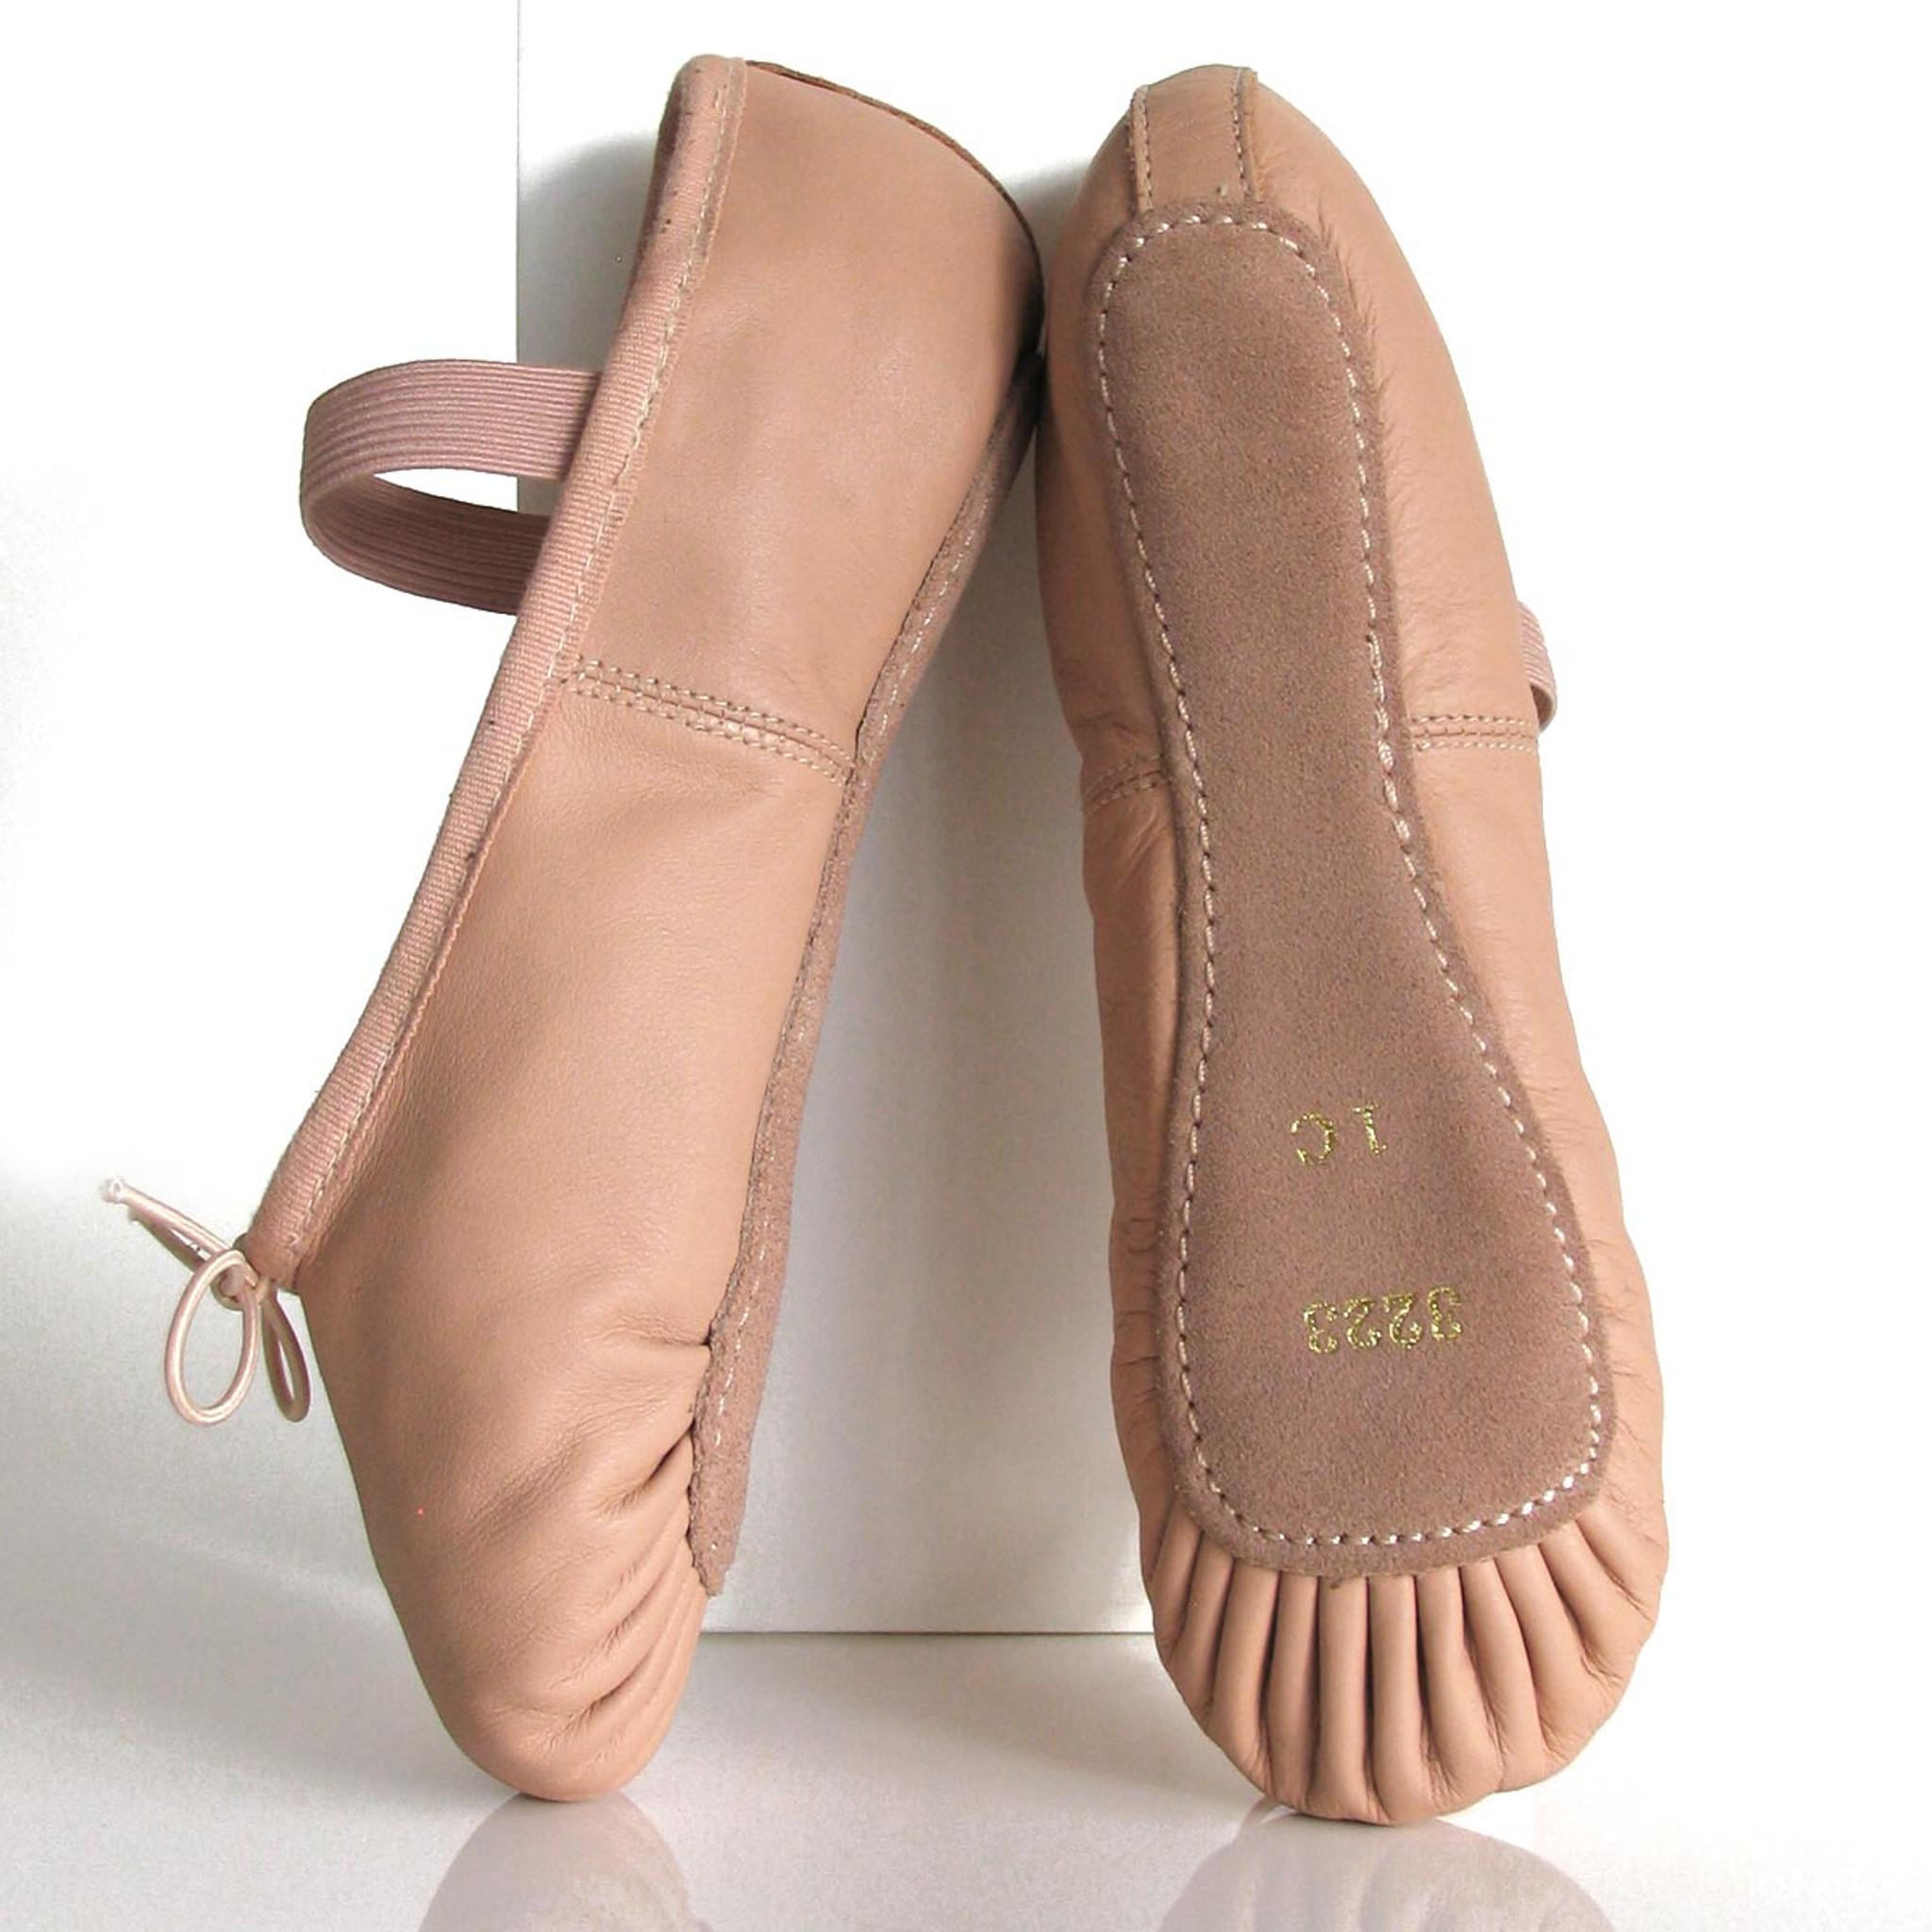 00fd22e8c15a Dance Direct Ballet Shoes Full Sole Leather - DANCE DIRECT®